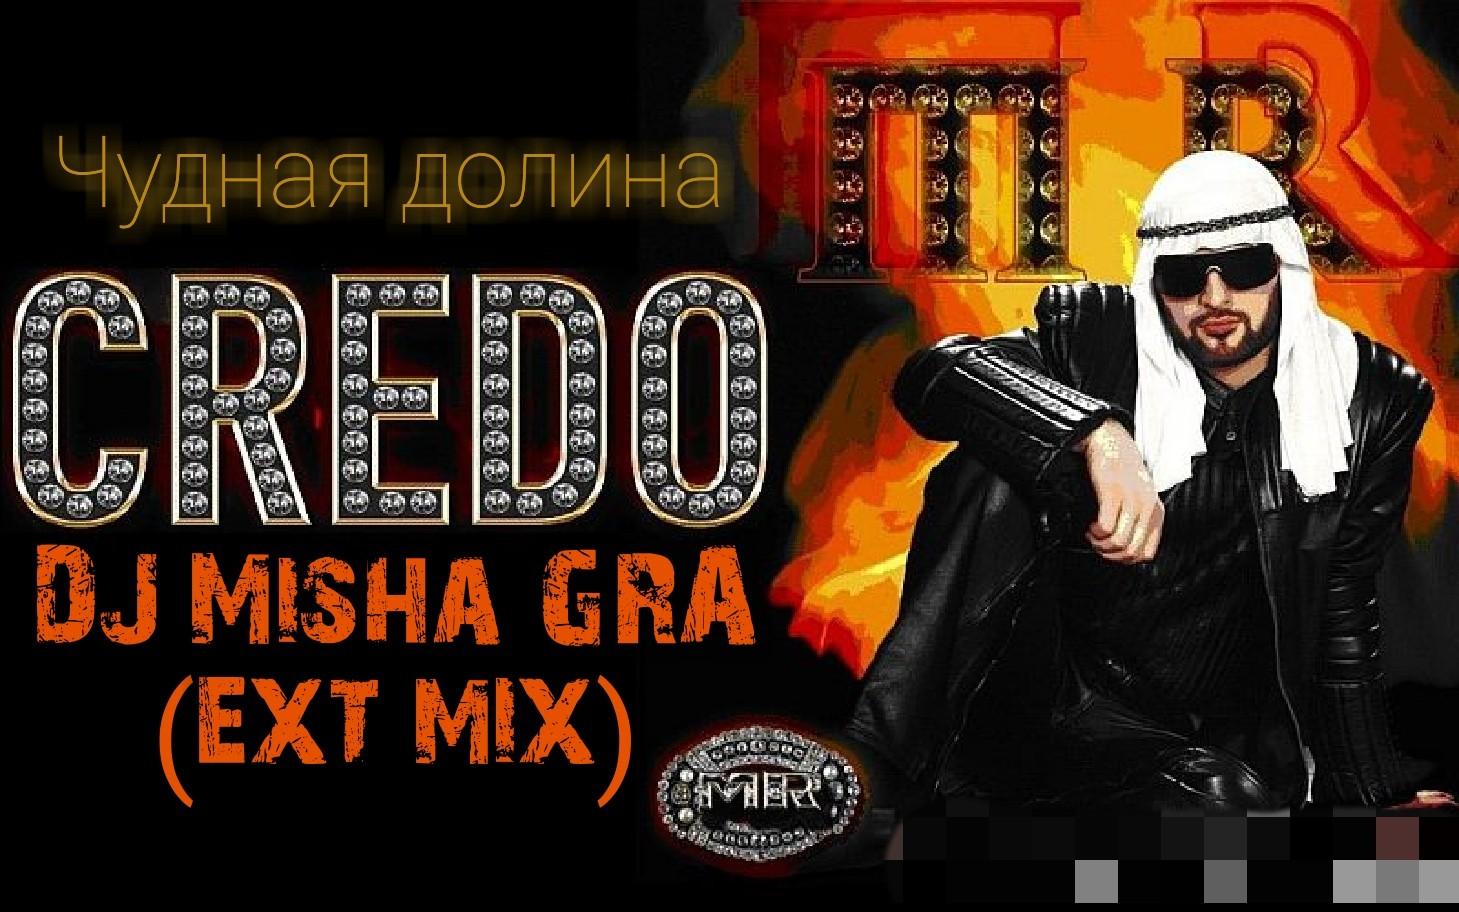 Mr Credo - Чудная долина (DJ Misha GRA ext mix)